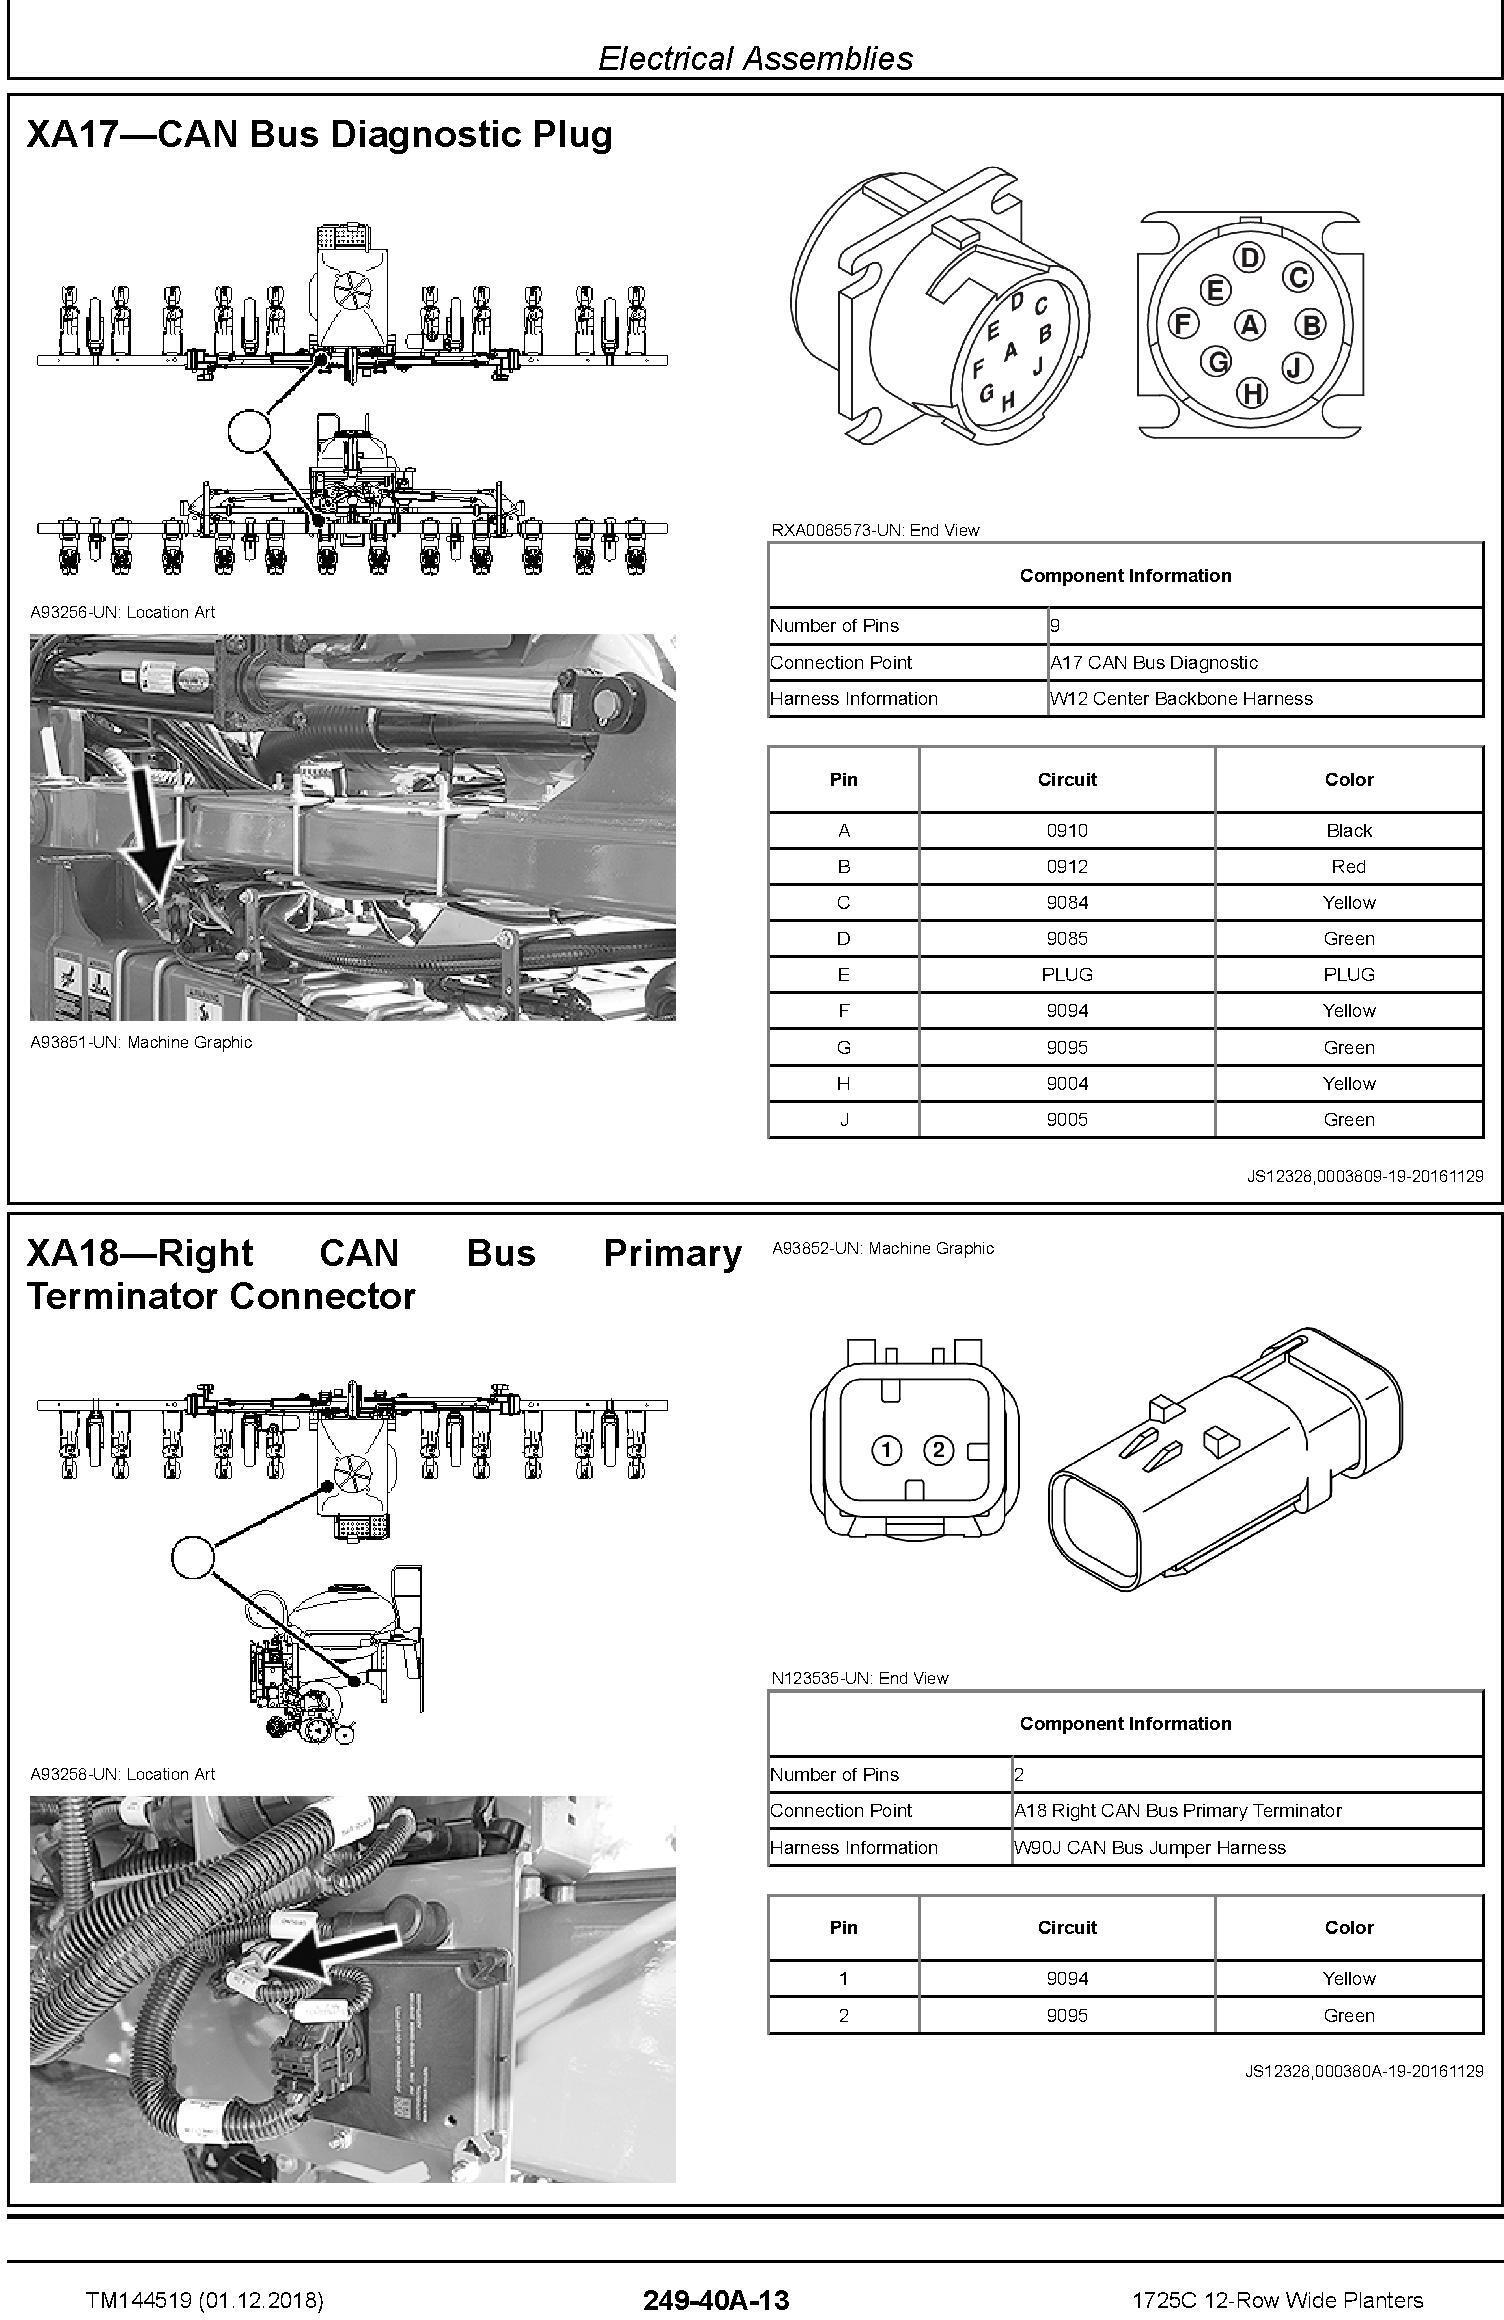 John Deere 1725C 12-Row Wide Planters Diagnostic Technical Service Manual (TM144519) - 1